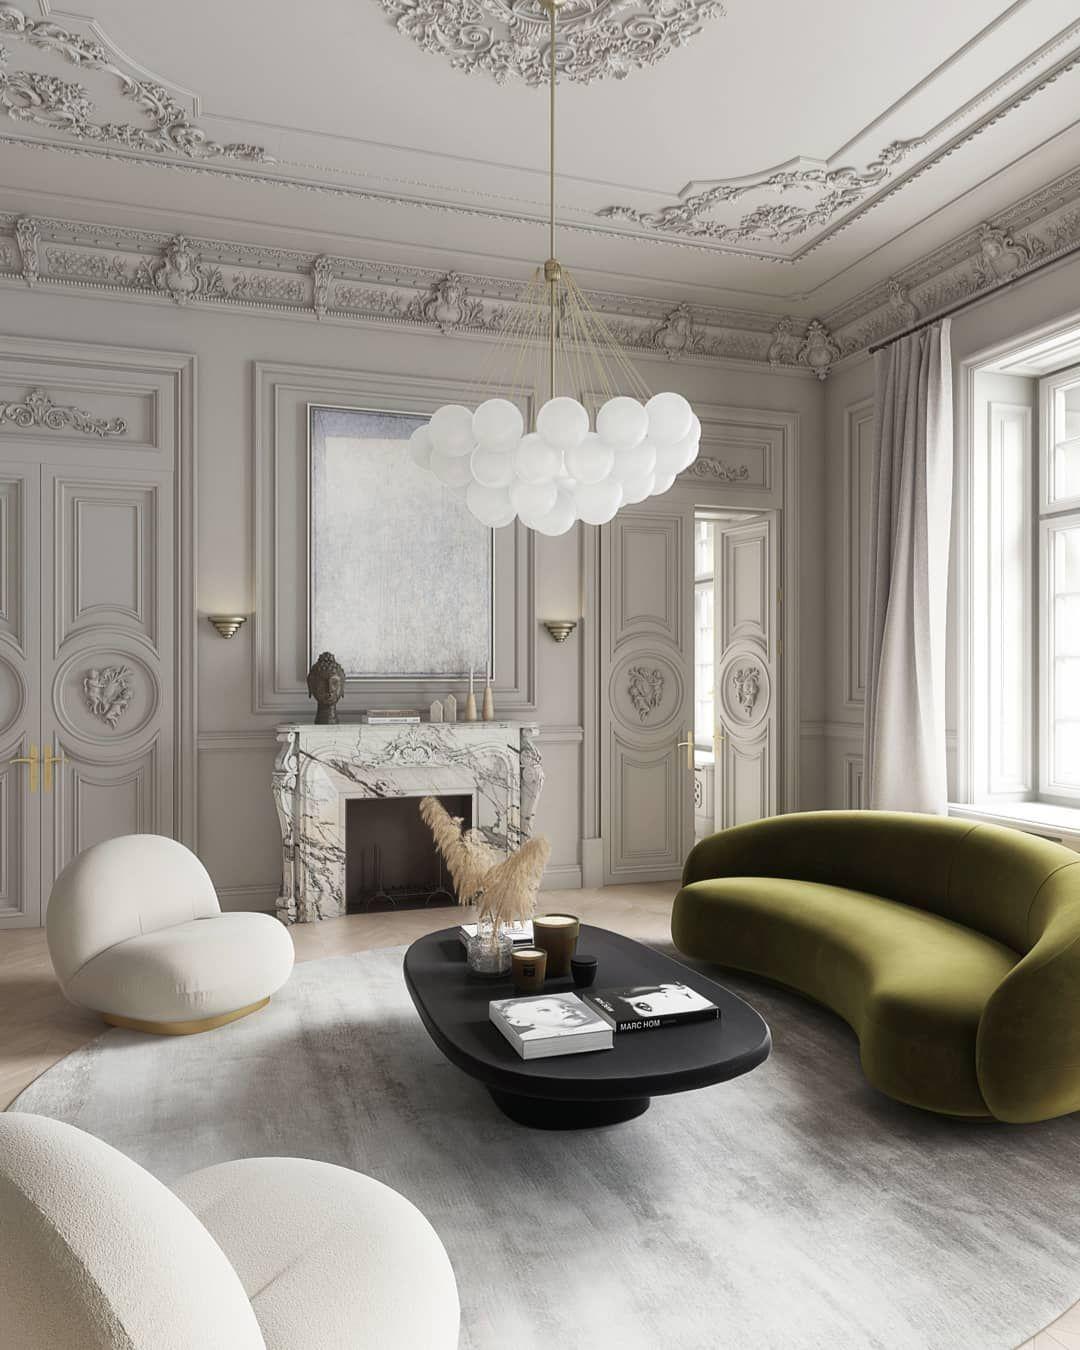 Pacha Lounge Chair Classic Interior Design Luxury Interior Design Luxury Home Decor